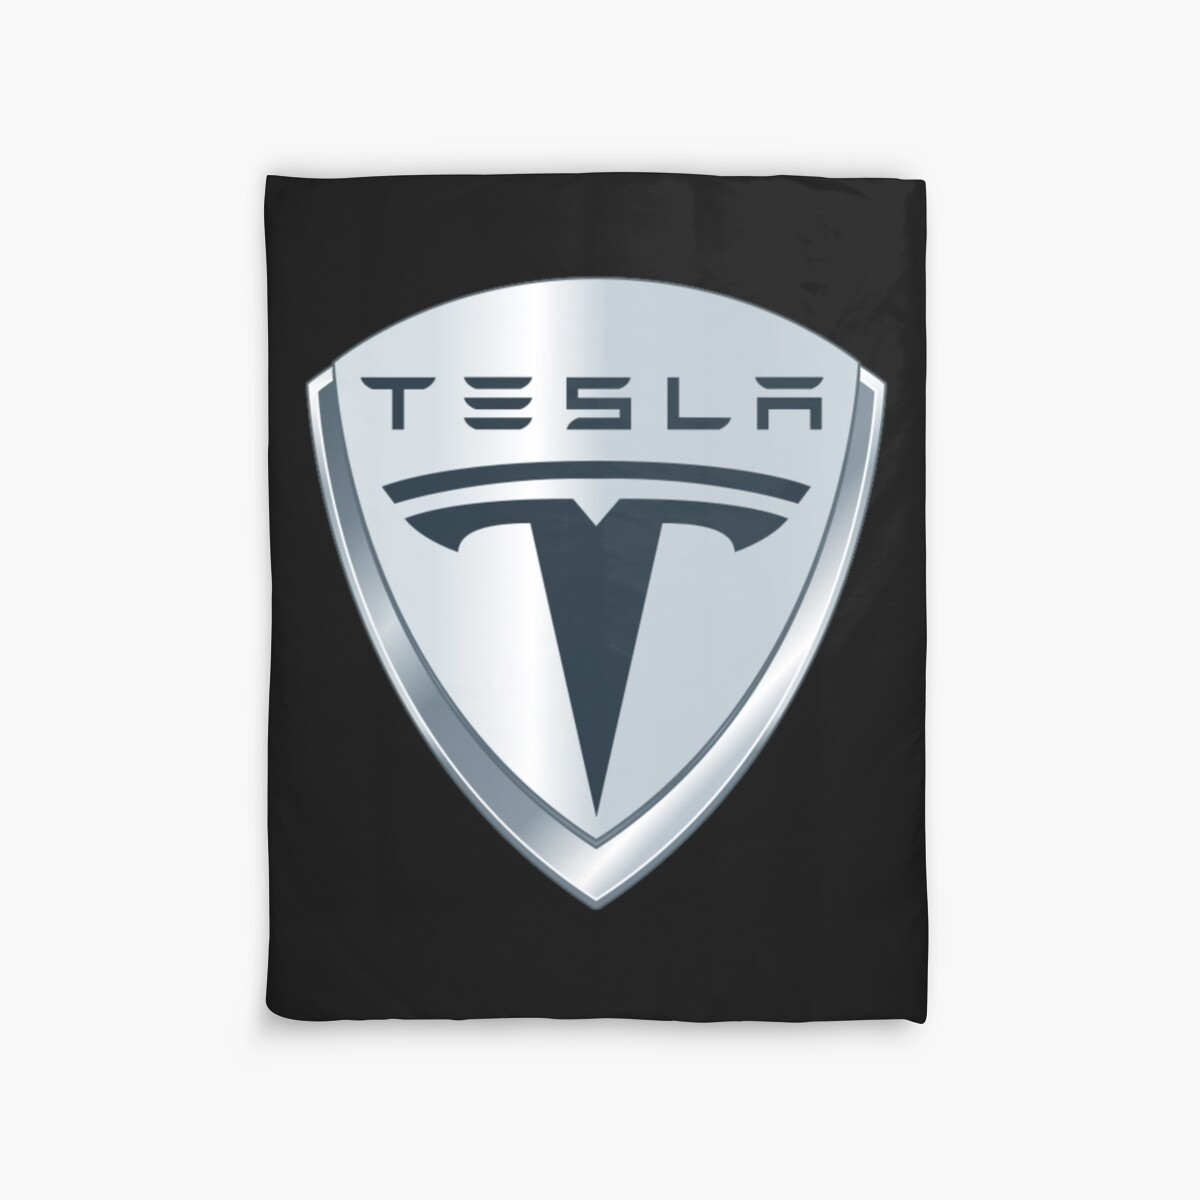 Tesla symbol duvet covers by fageraweda redbubble tesla symbol by fageraweda biocorpaavc